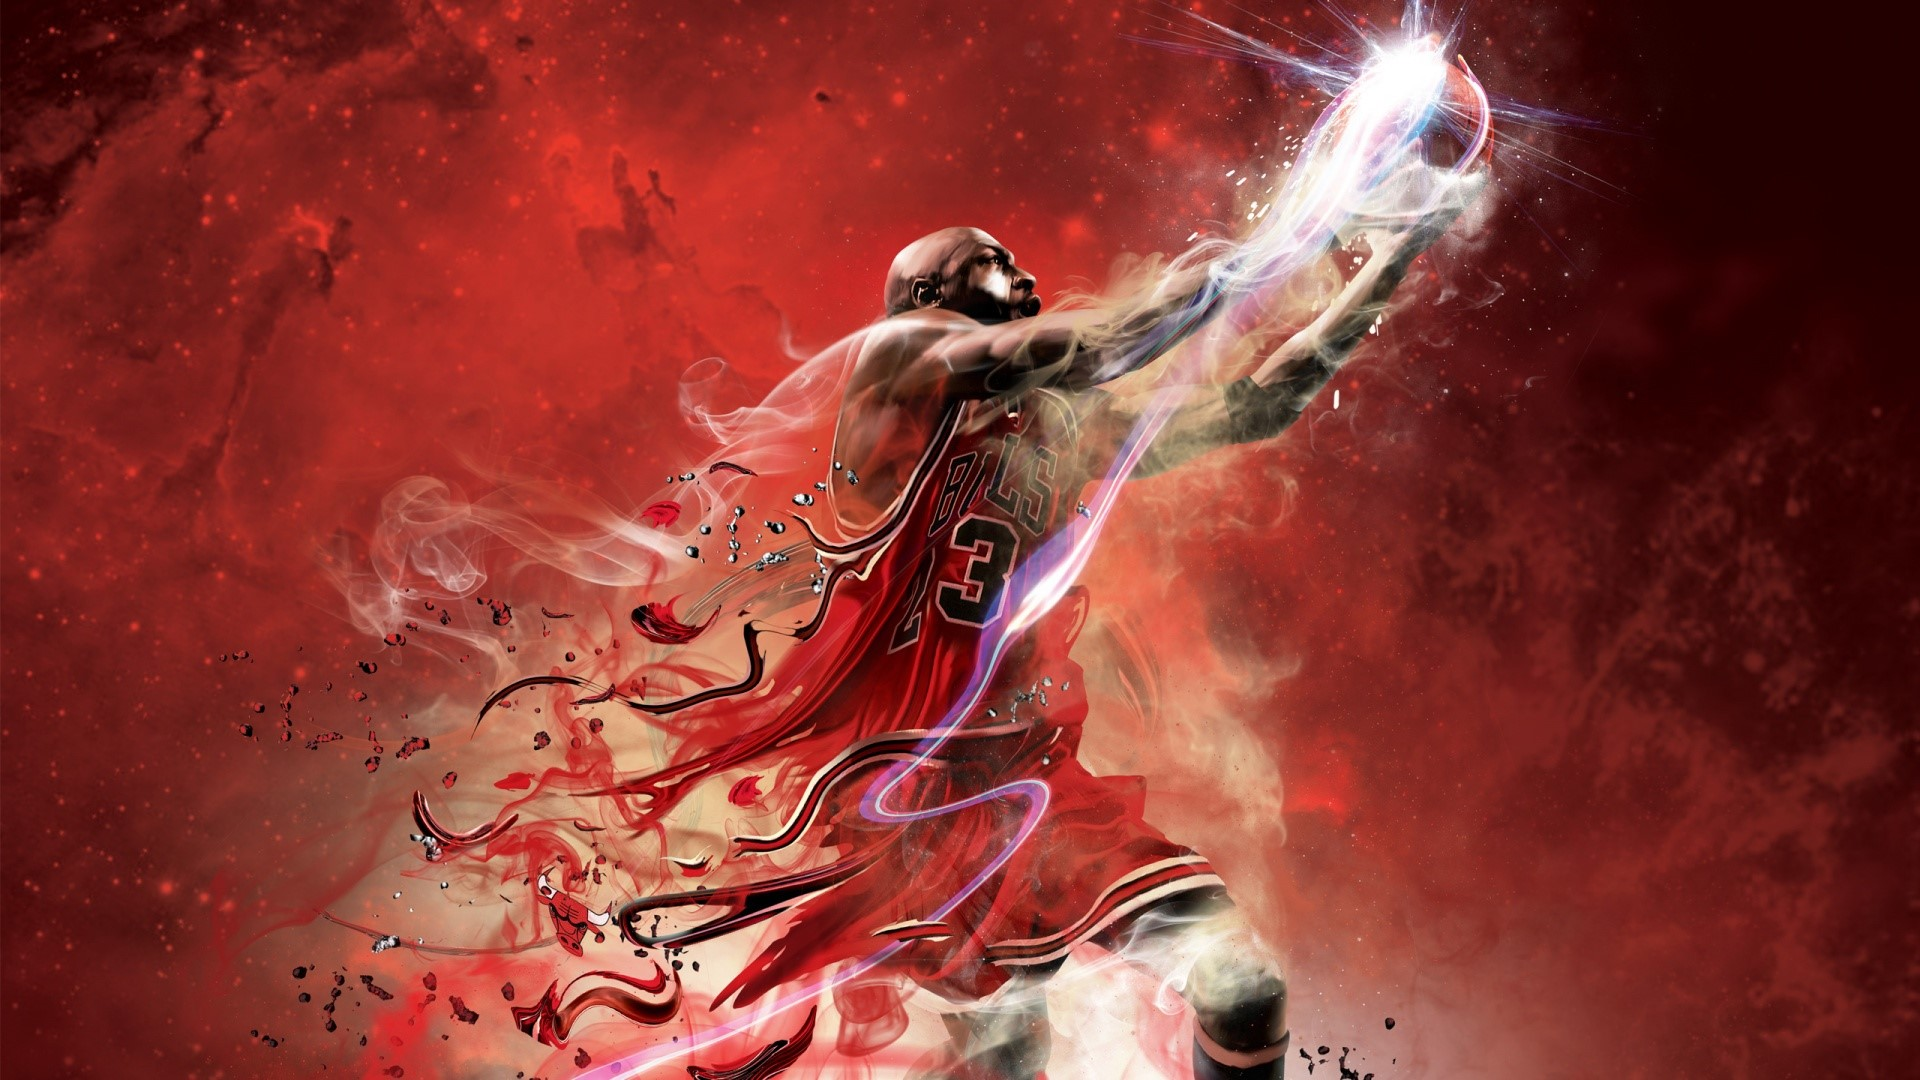 Michael Jordan Background images